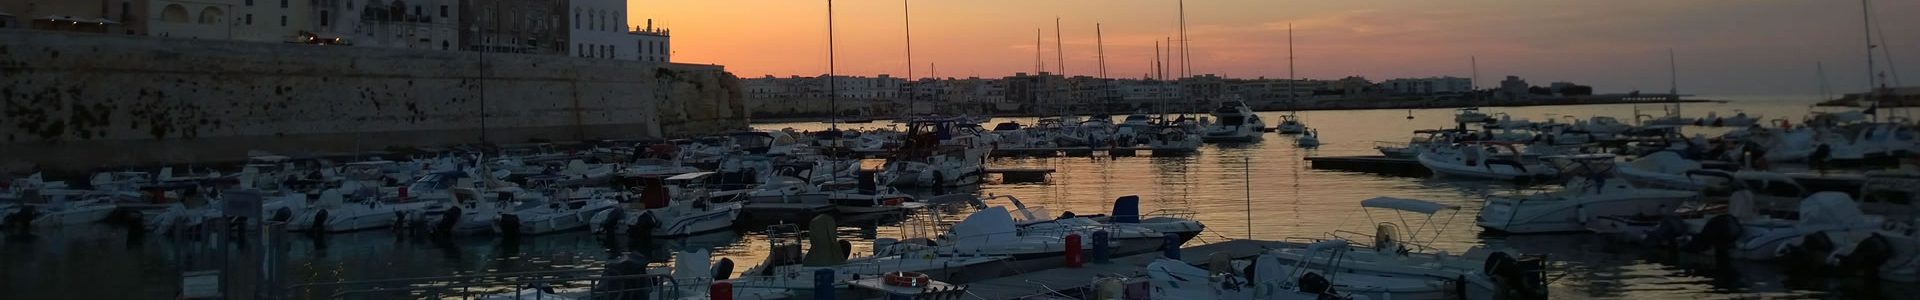 Casa Vacanze 2 ad Otranto